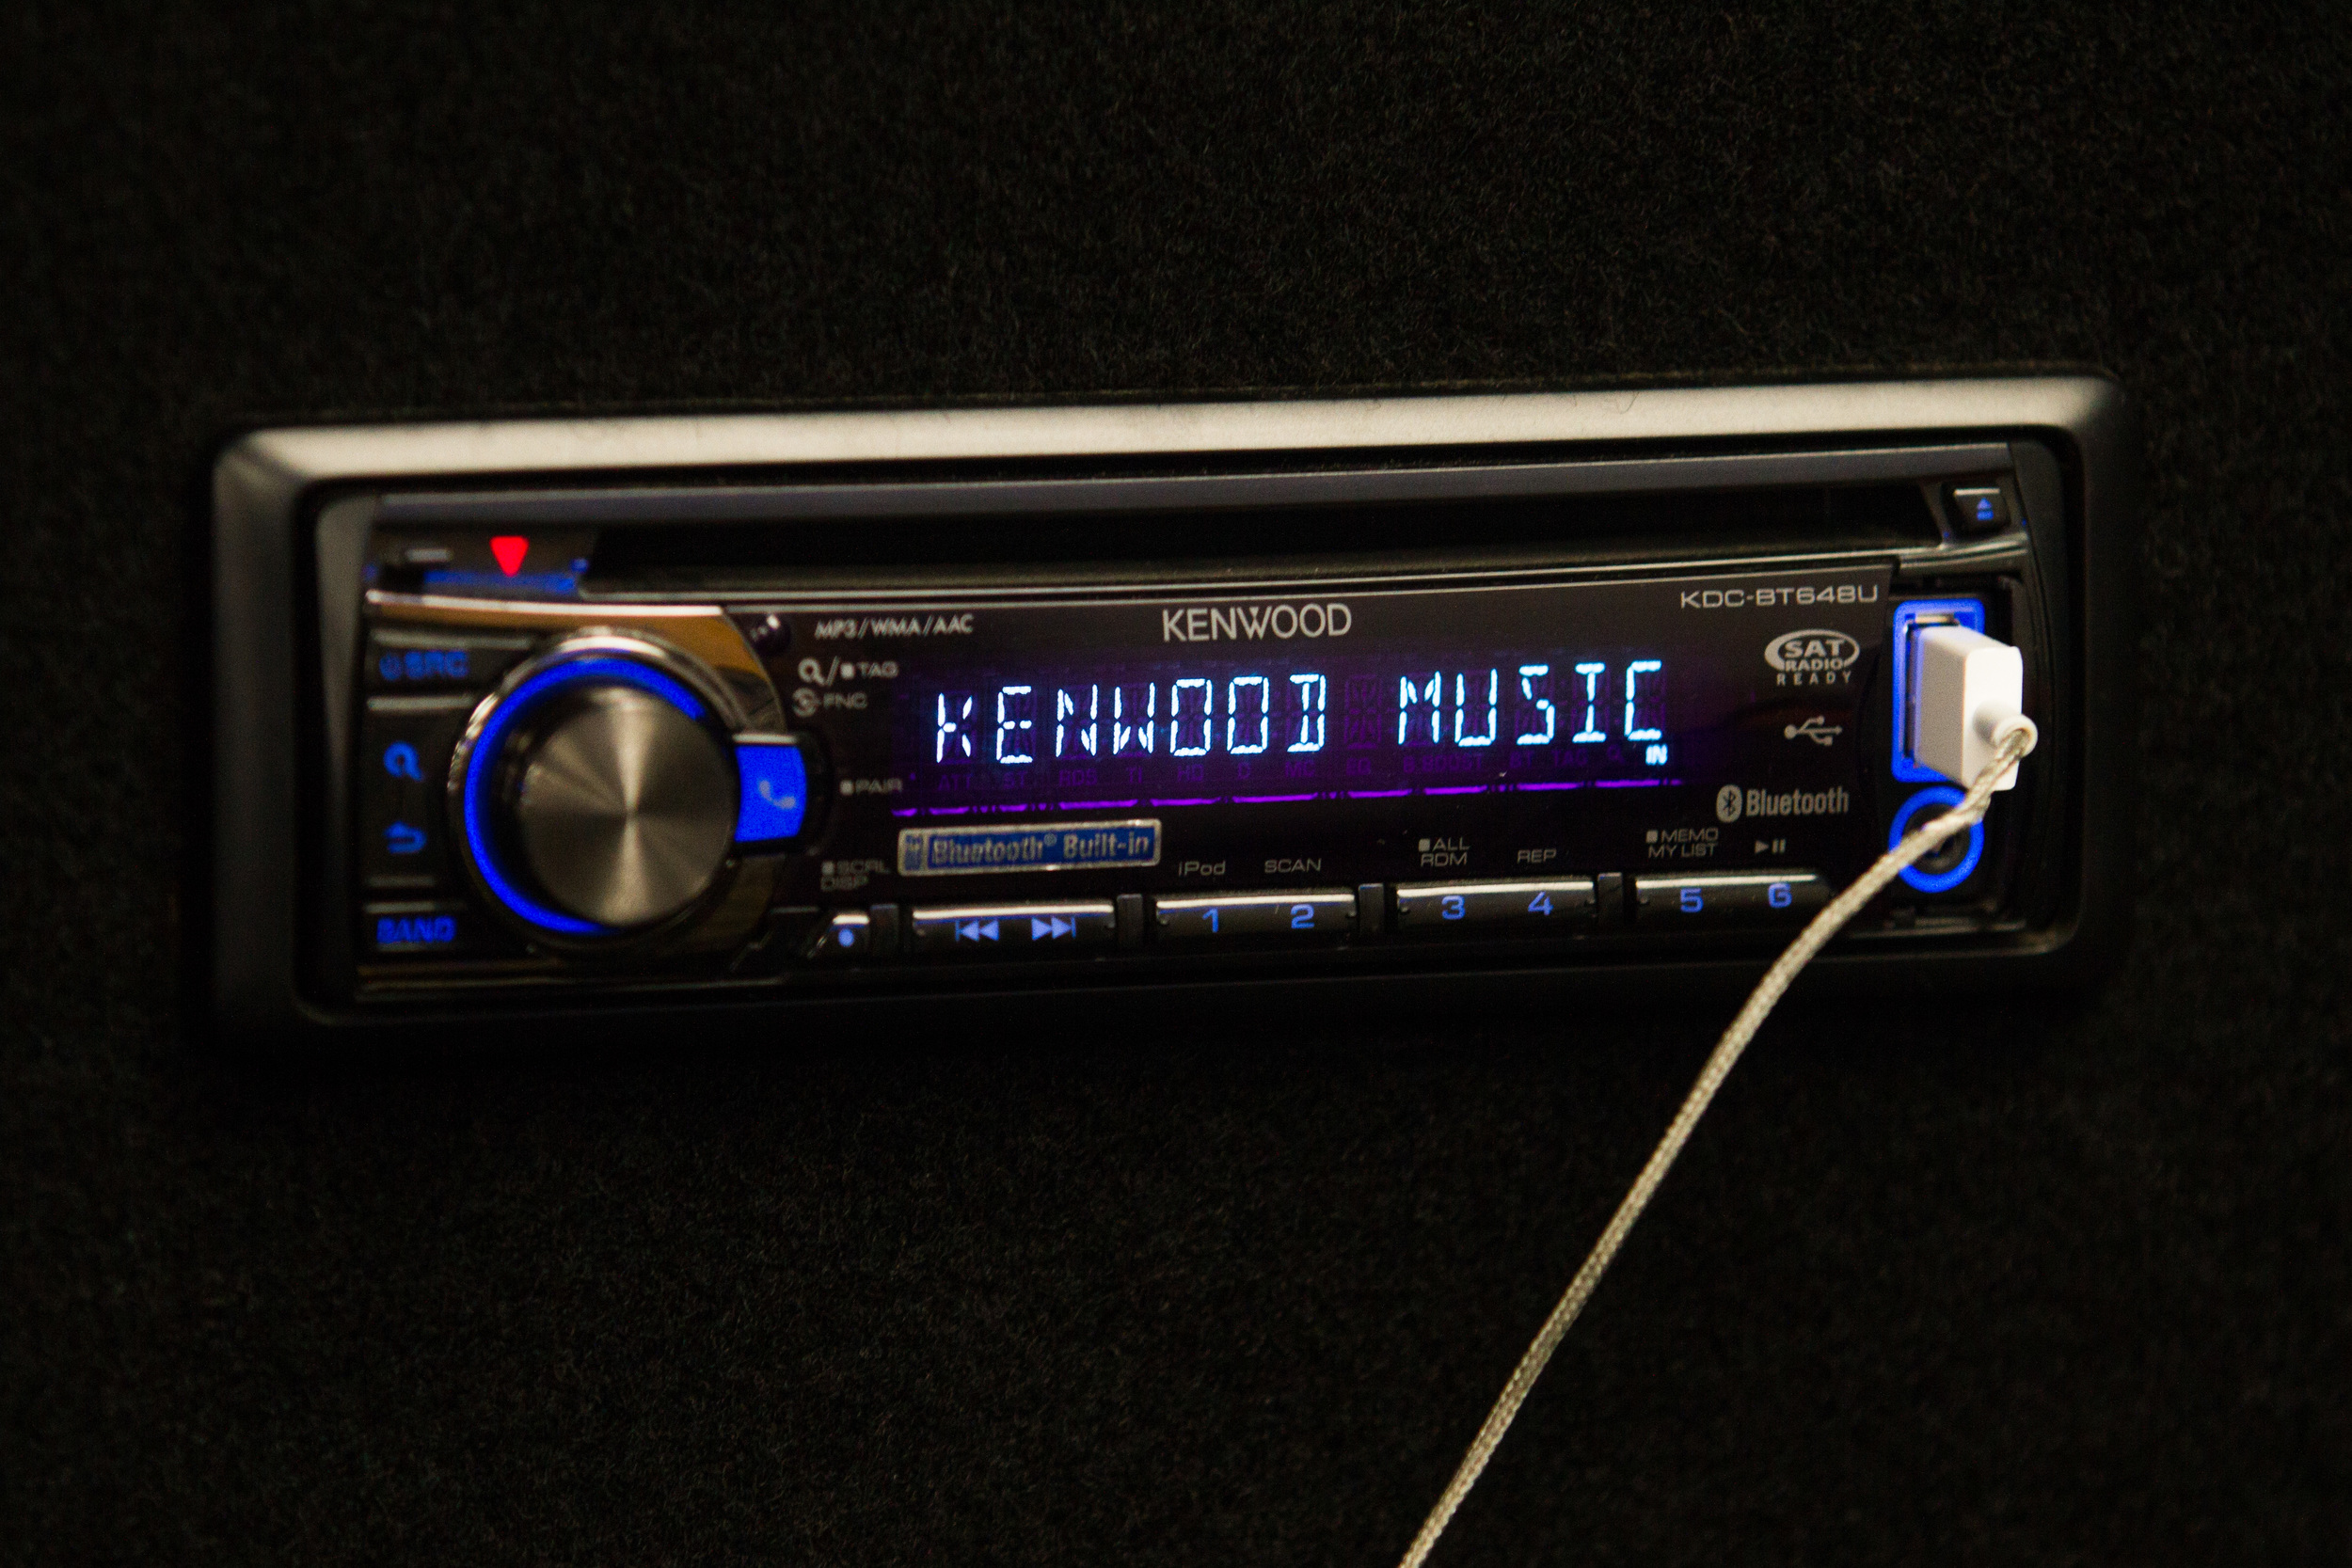 Kenwood Stereo San Diego